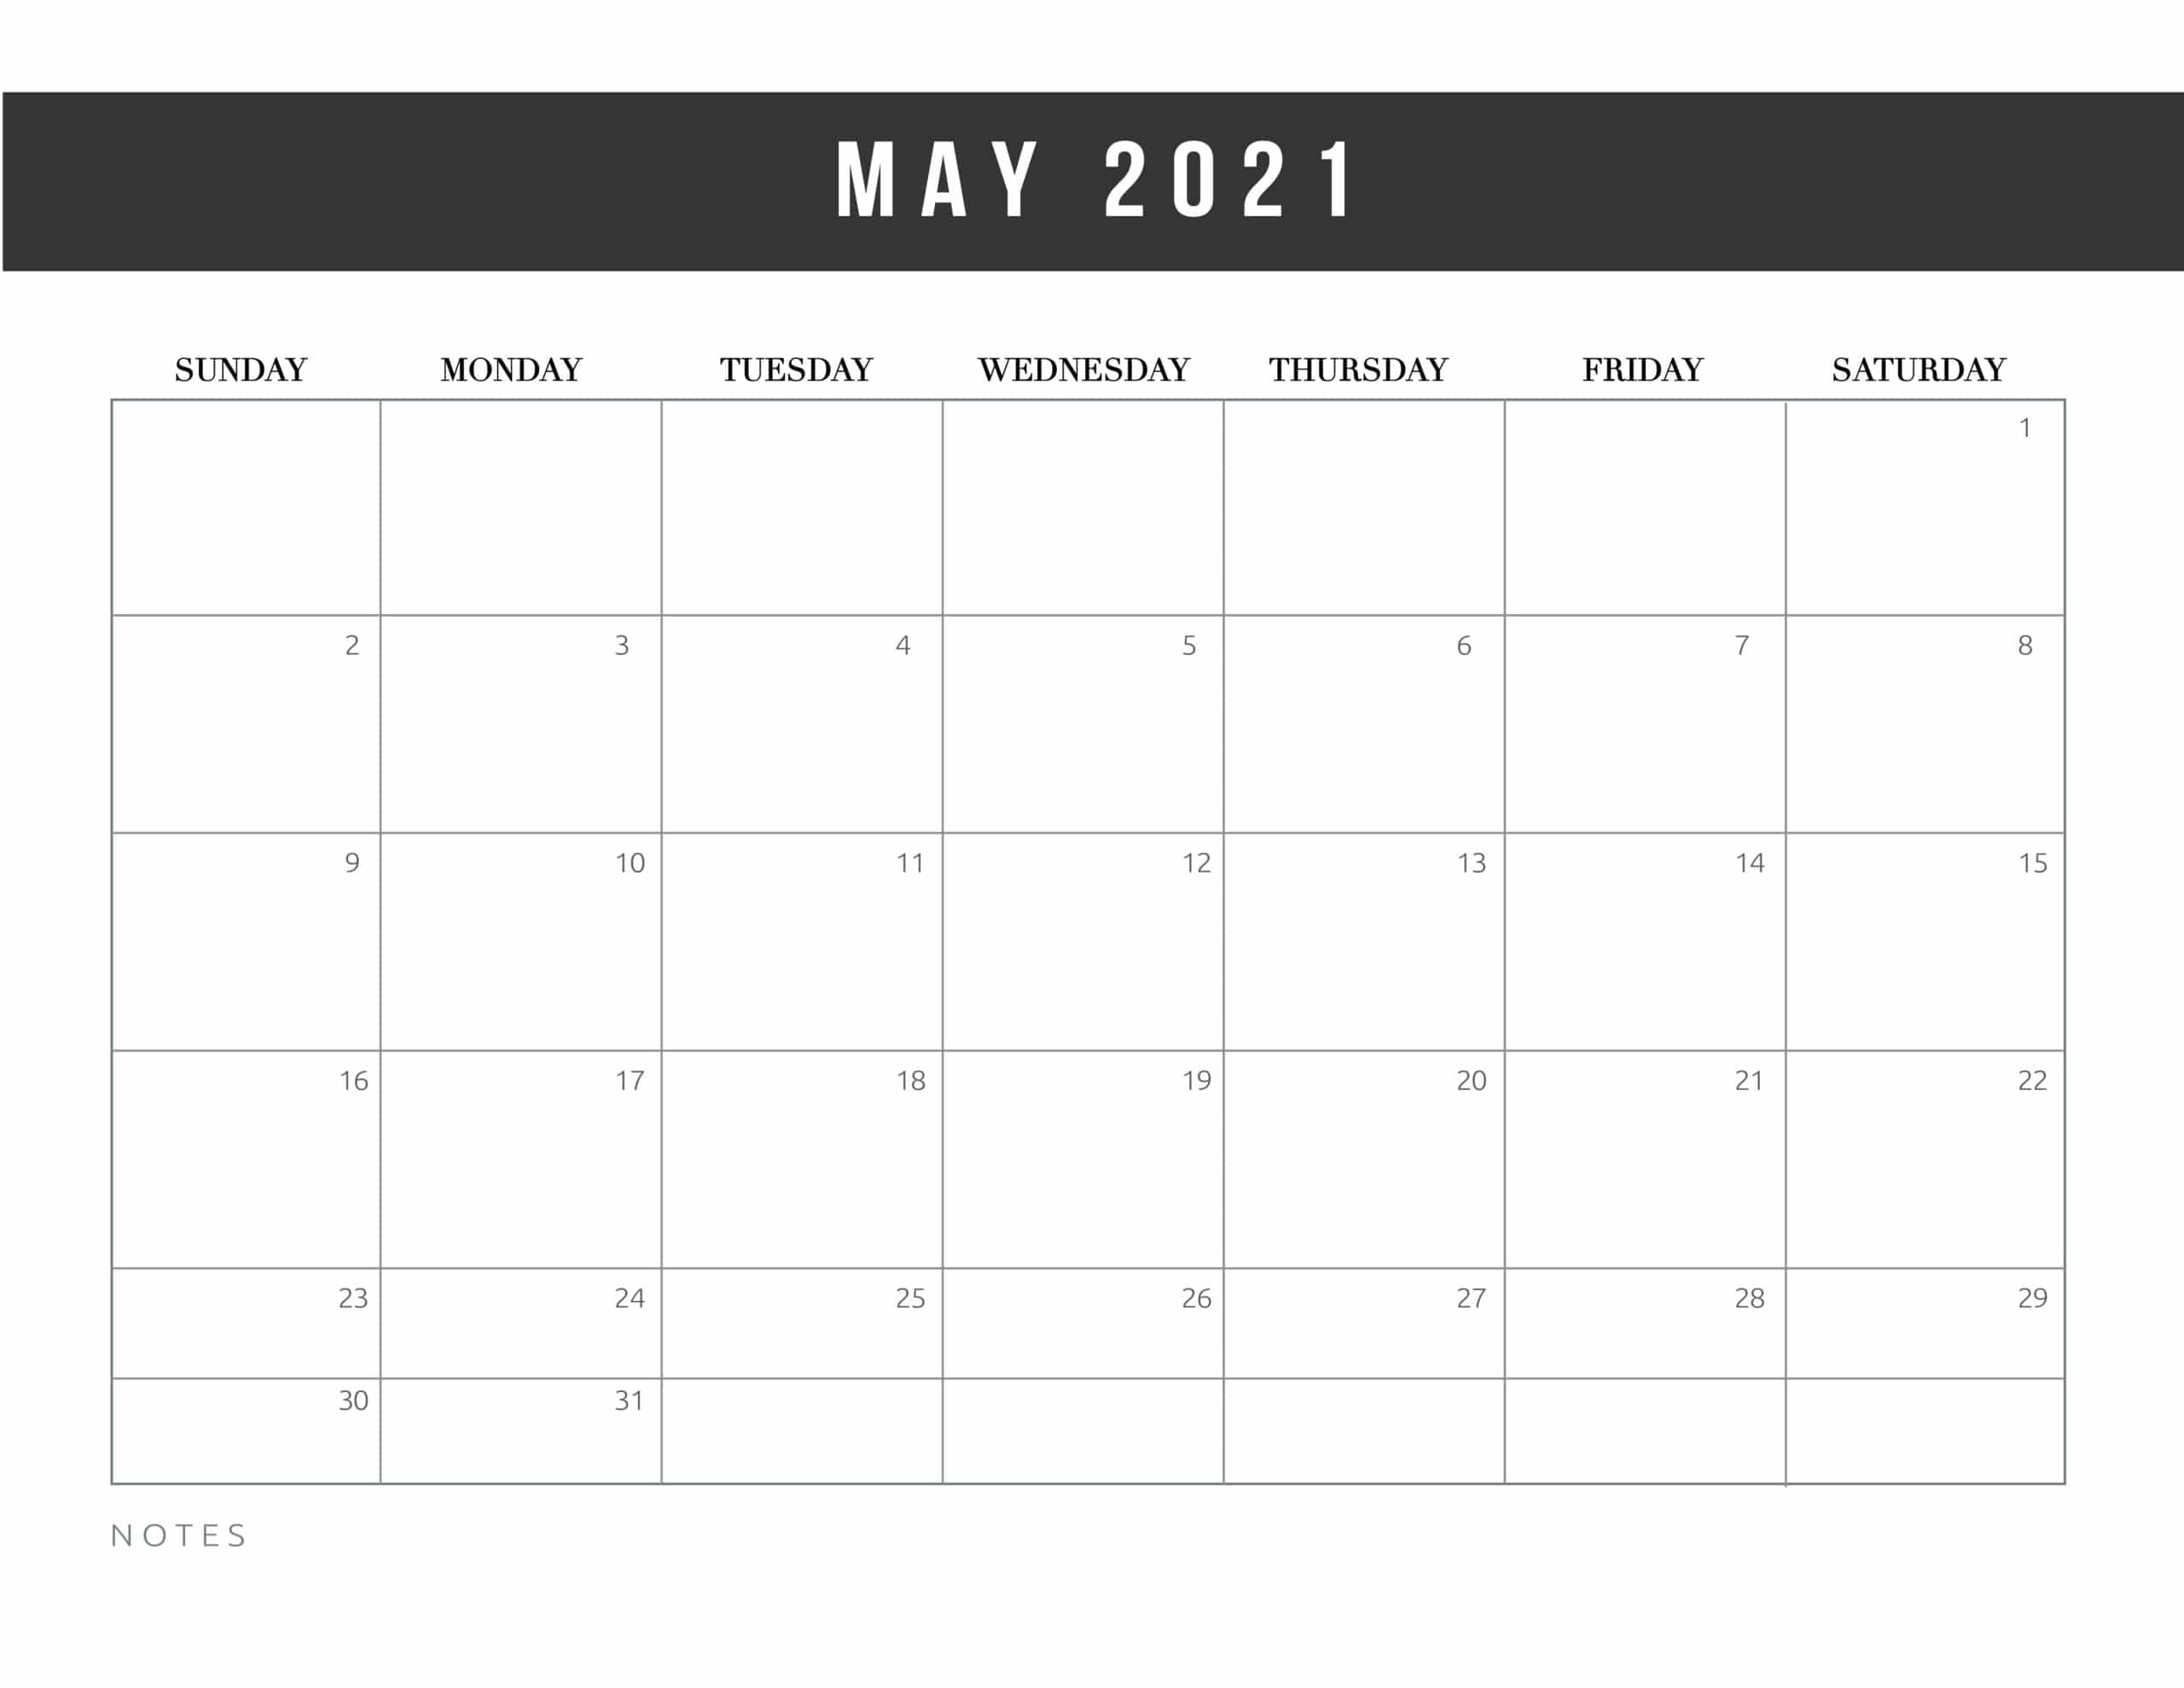 Free Printable May 2021 Calendars World Of Printables